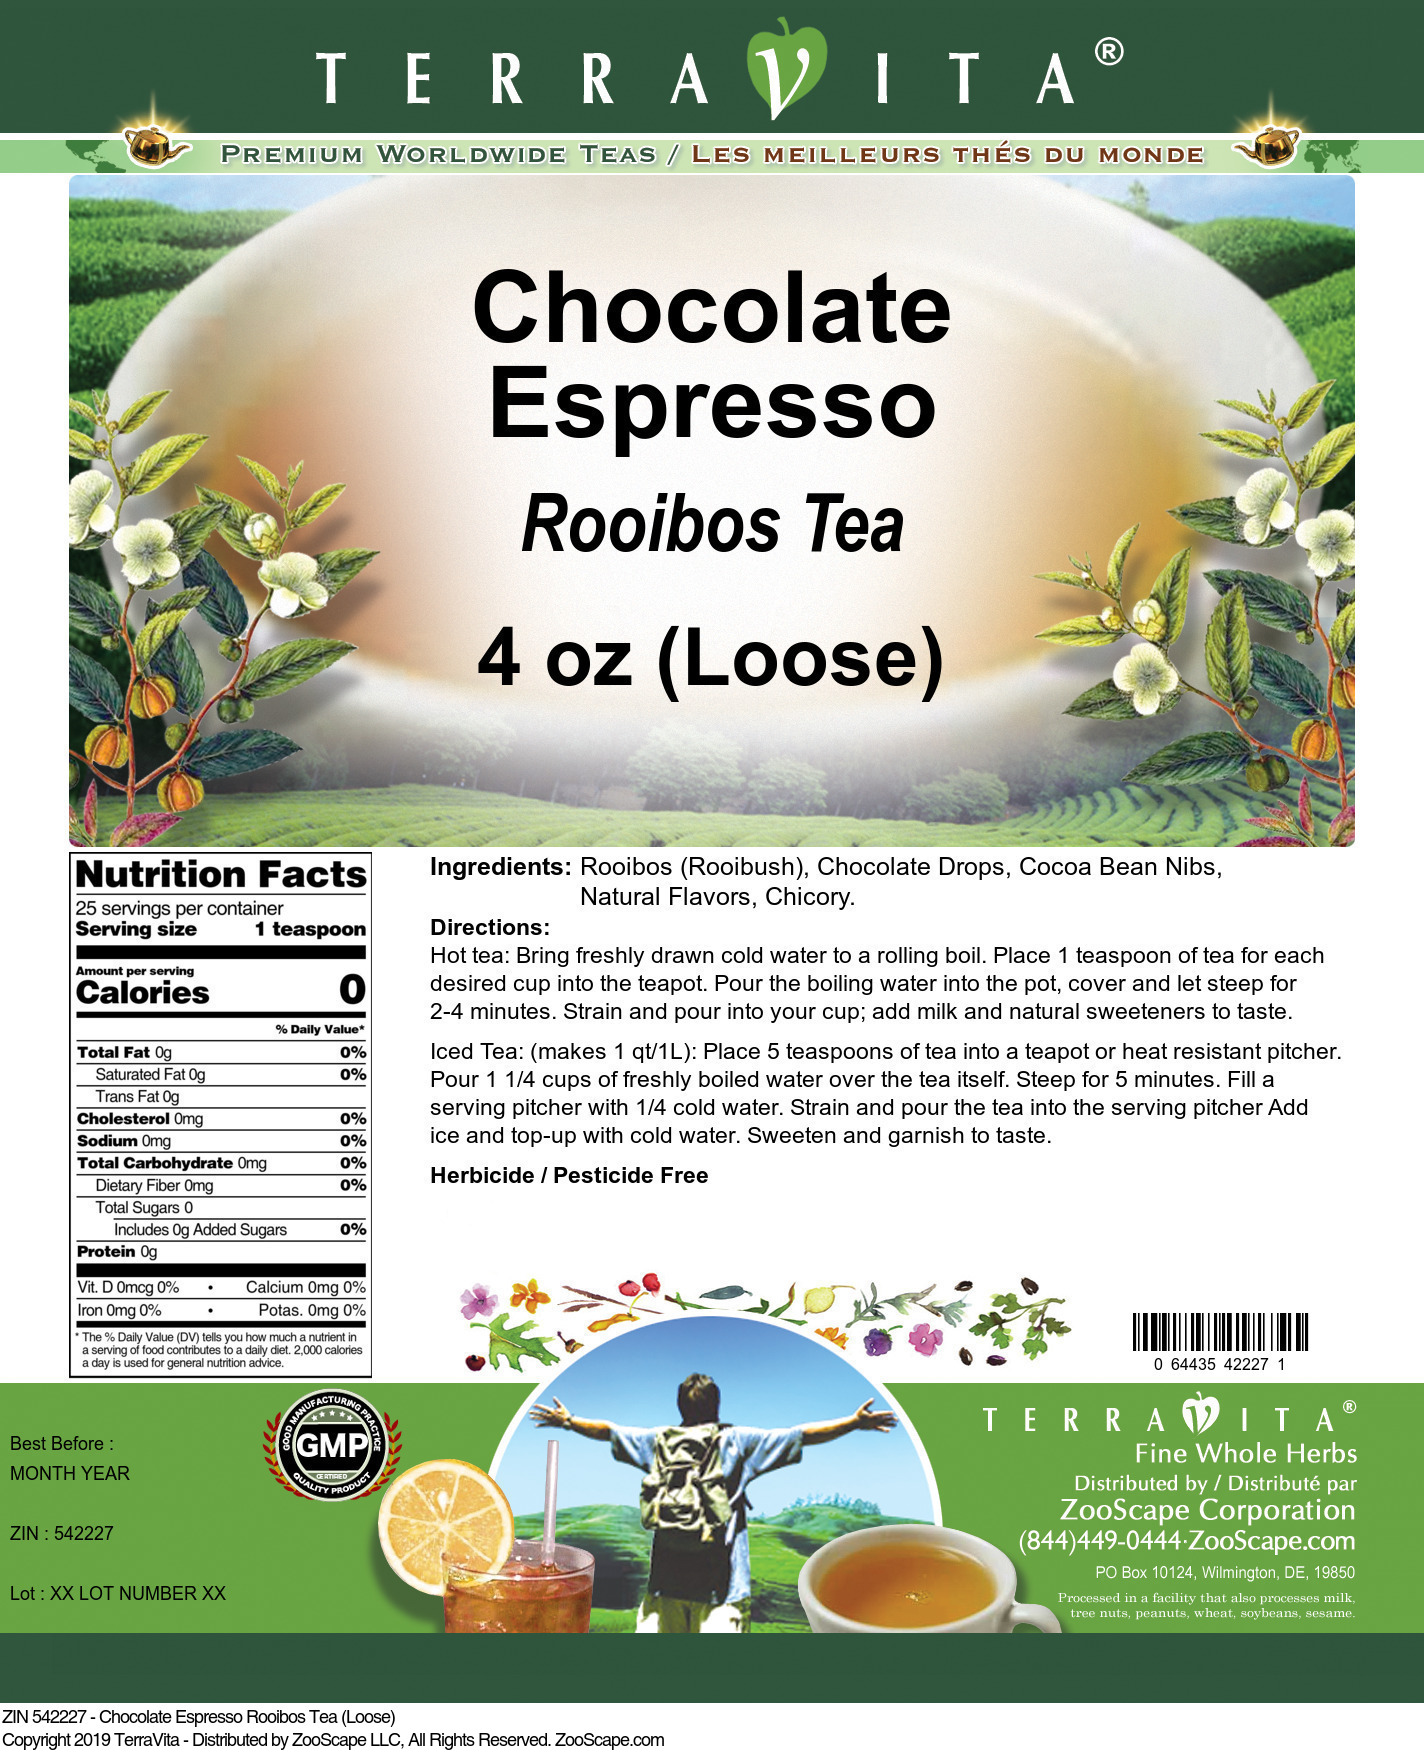 Chocolate Espresso Rooibos Tea (Loose)